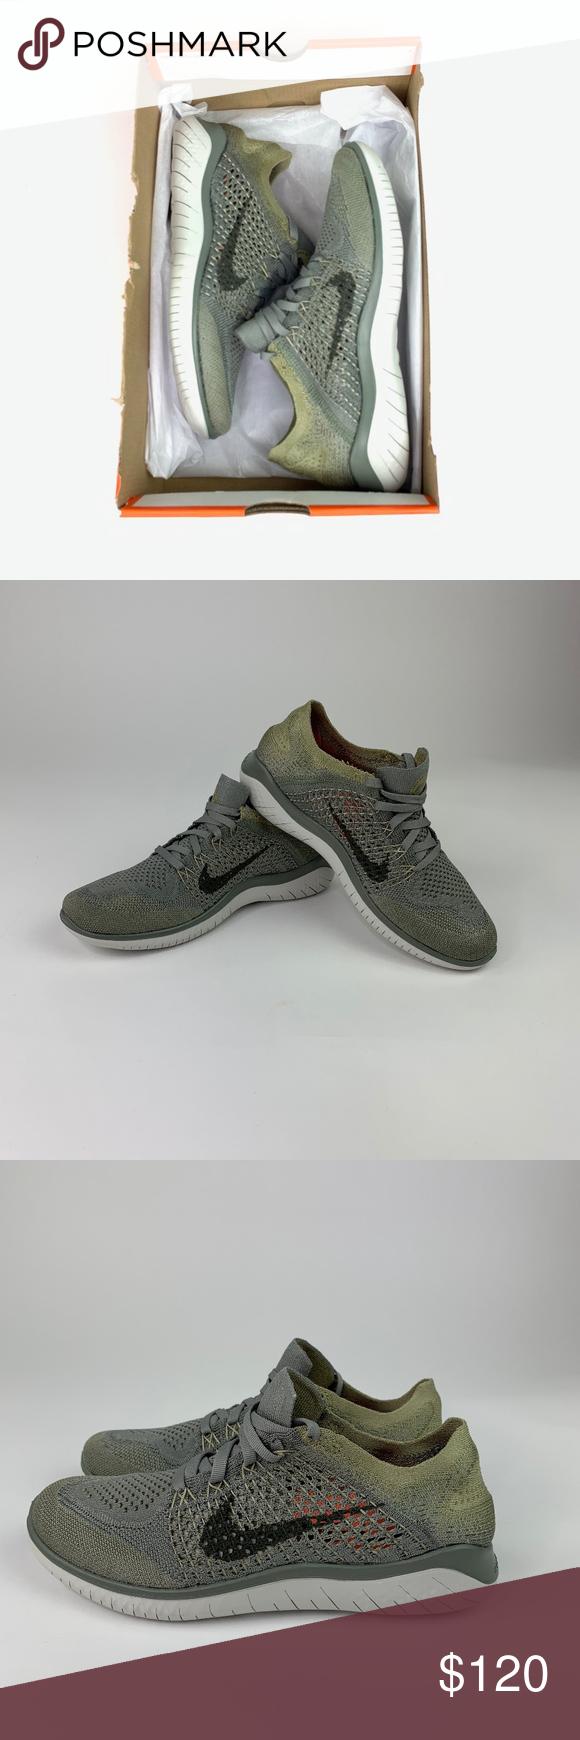 Online Store Nike Free Rn Flyknit Running Cargo KhakiBlack